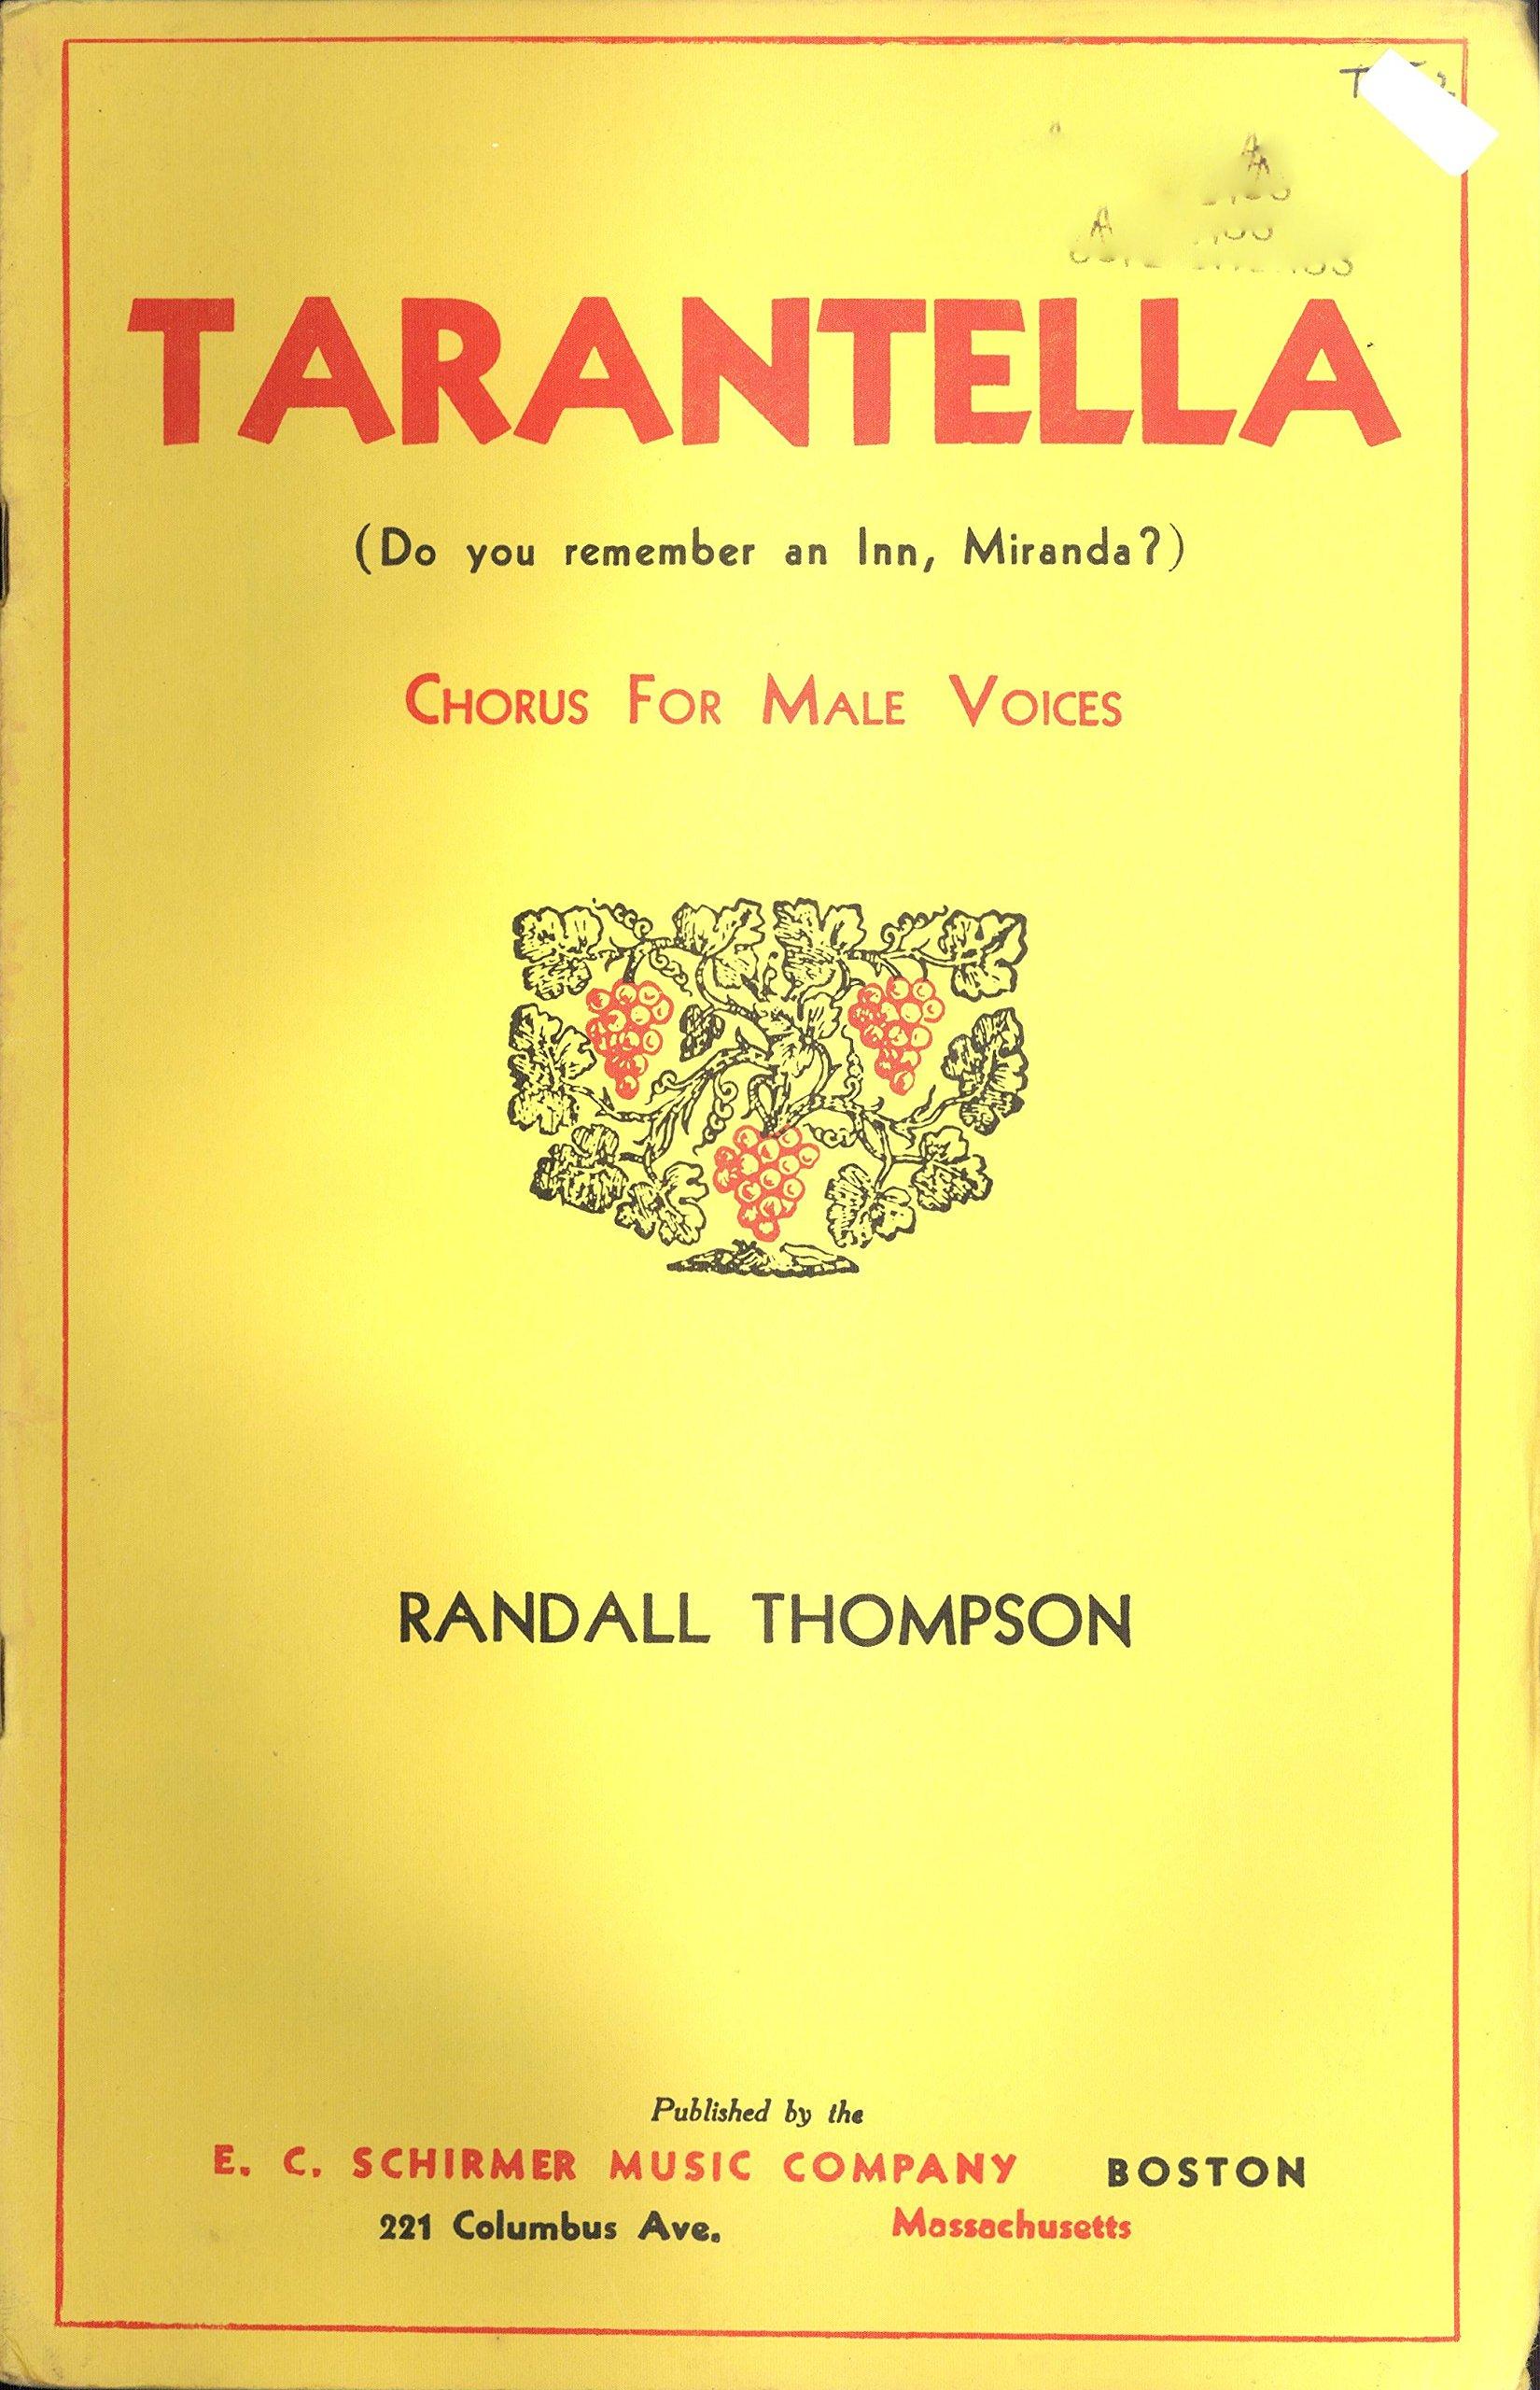 tarantella do you remember an inn miranda chorus for male voices